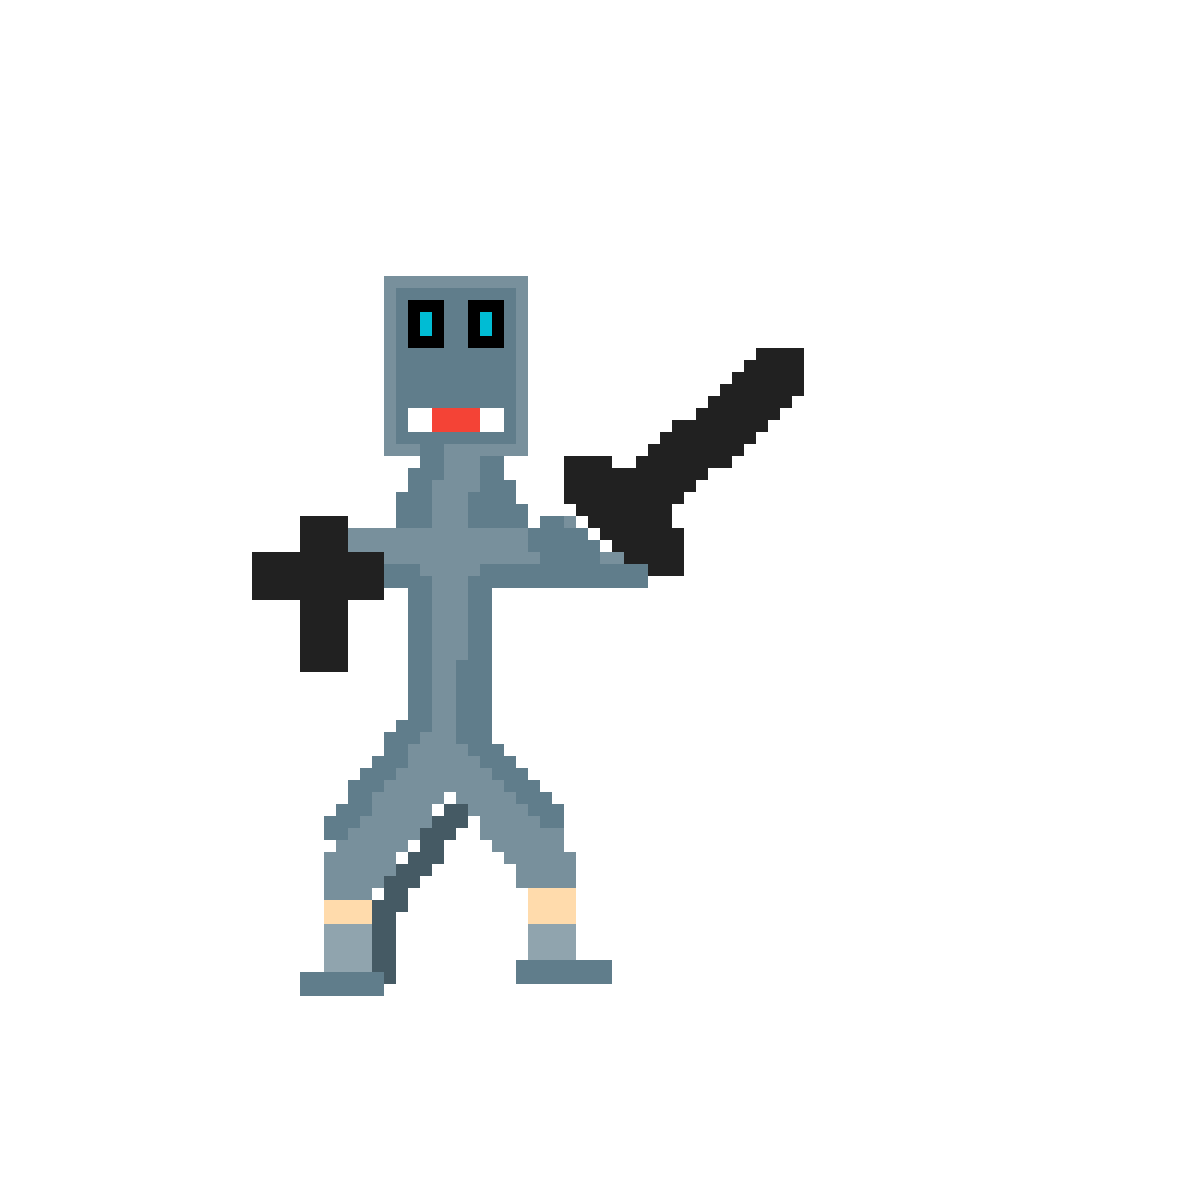 main-image-Fantasy Stick Figure 1 - Knight  by strykerr4